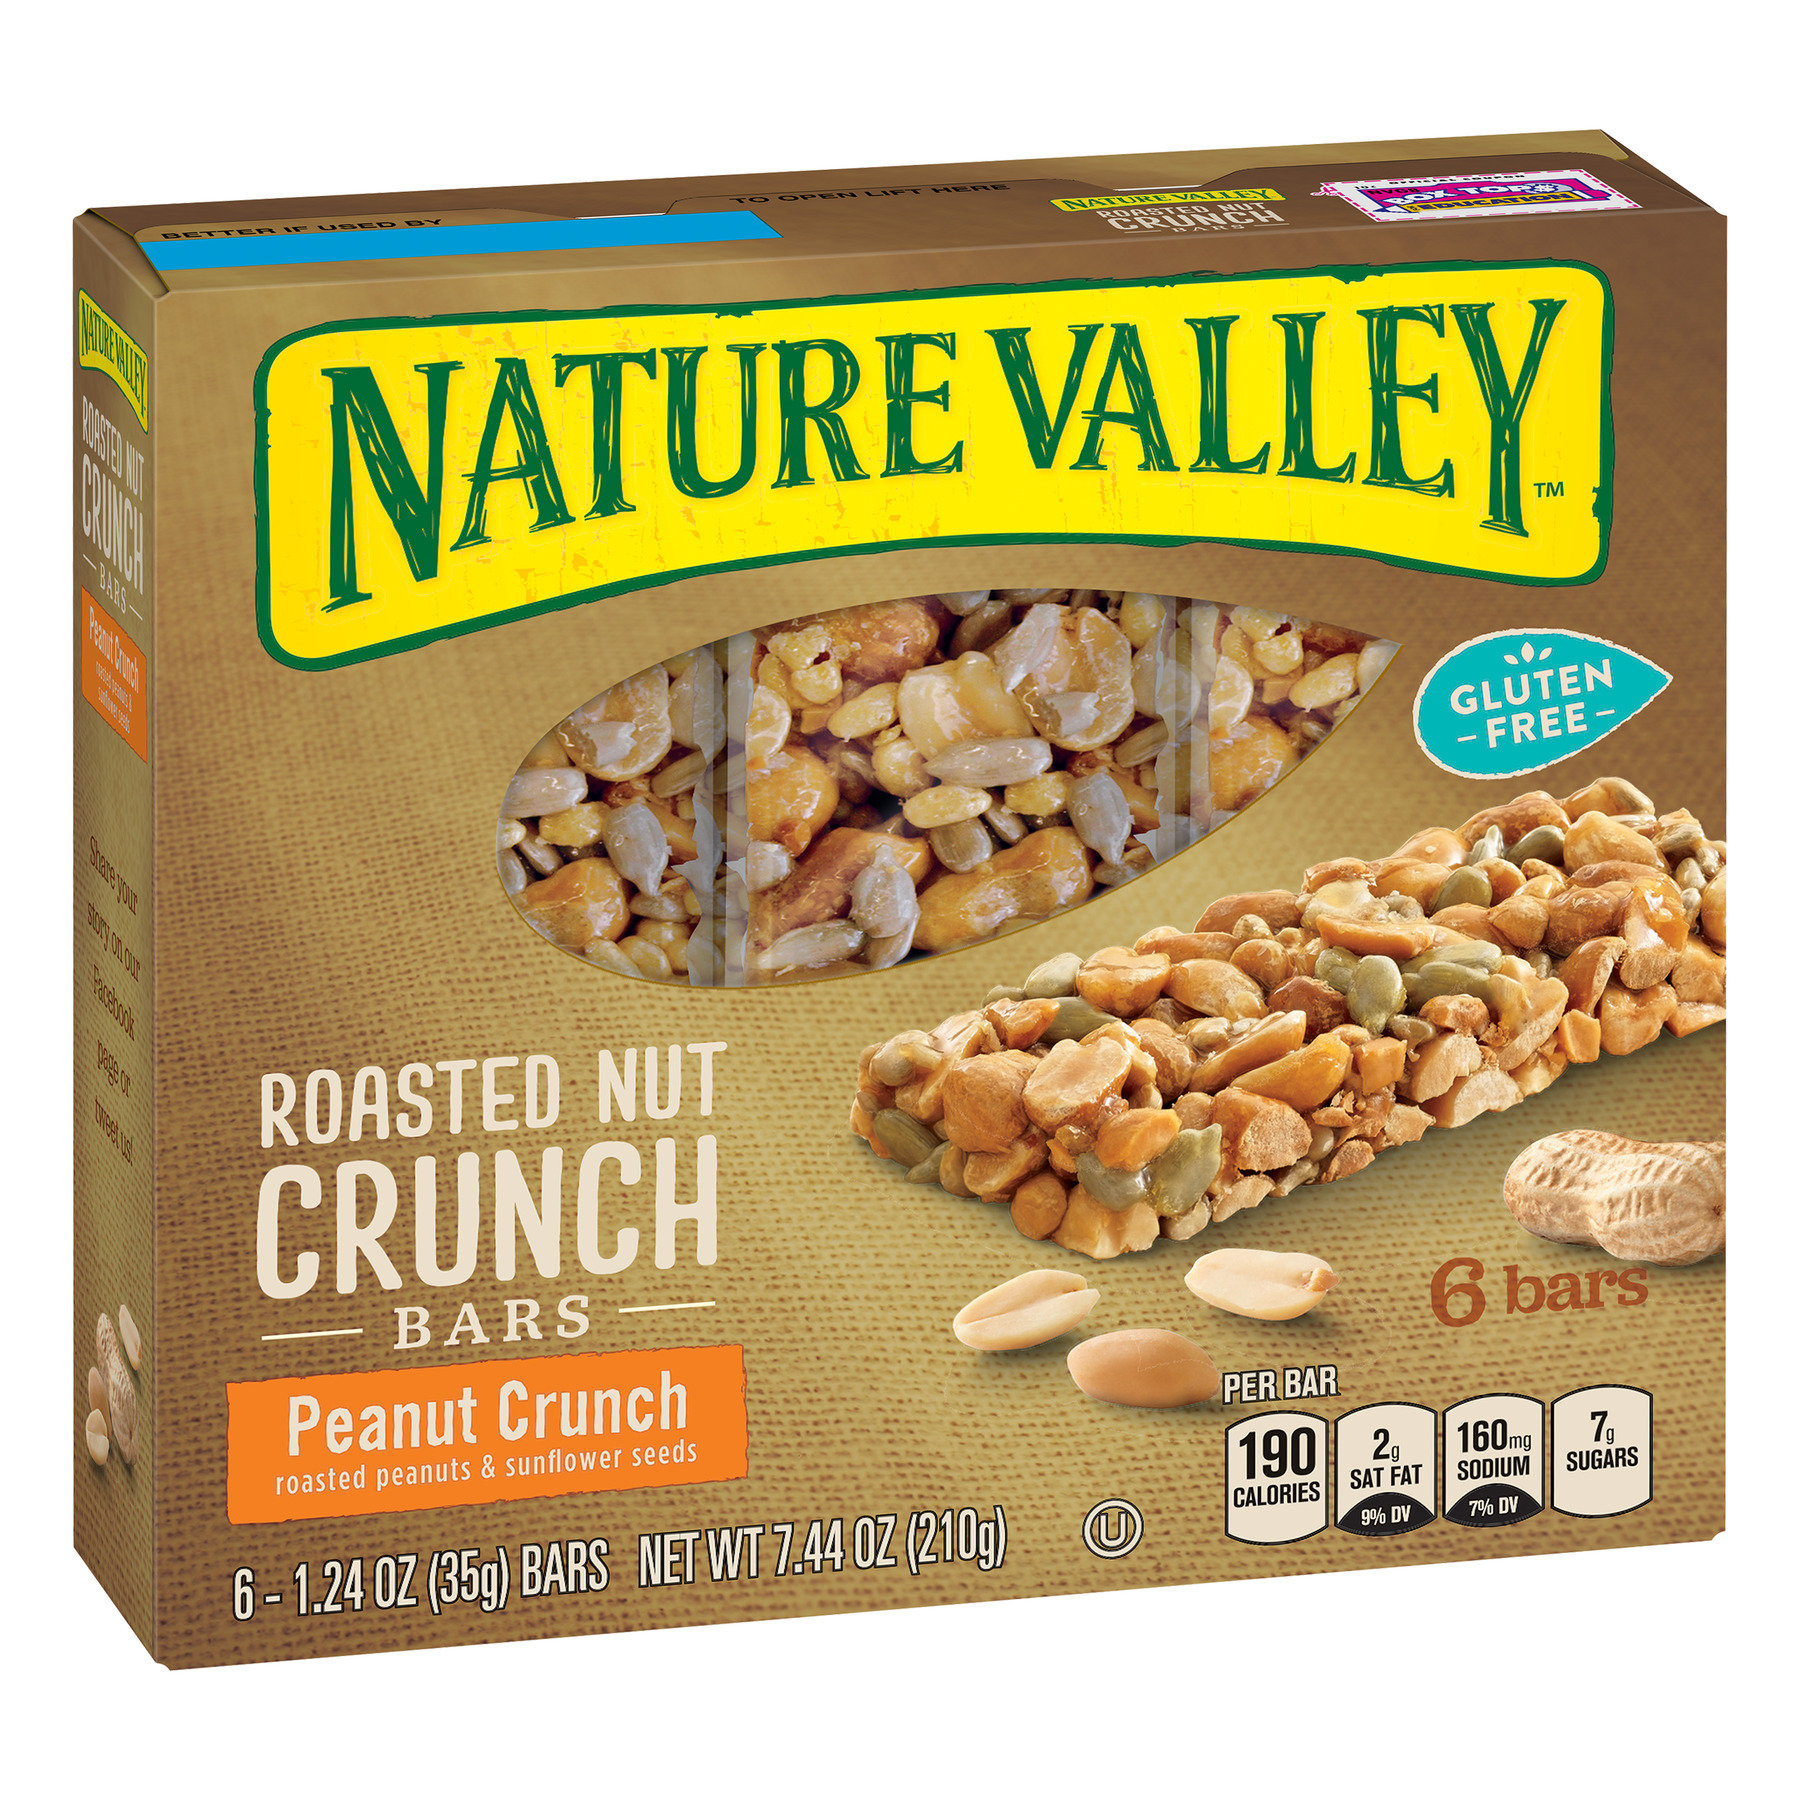 (2 Pack) Nature Valley Granola Bars Roasted Nut Crunch Peanut Crunch 6 Bars